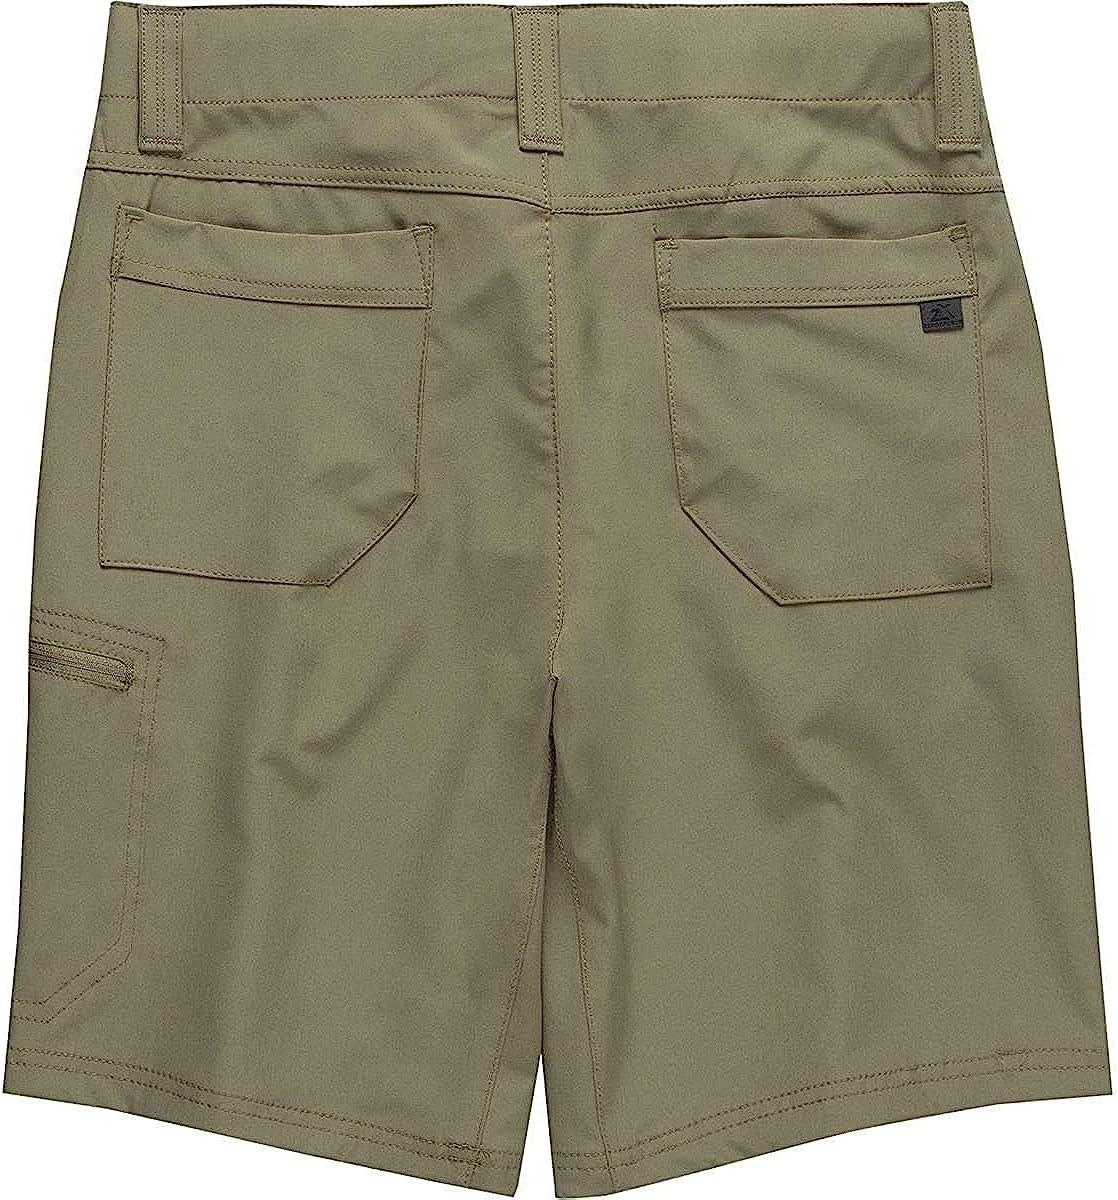 ZeroXposur Mens Travel Flex Stretch Lightweight Shorts